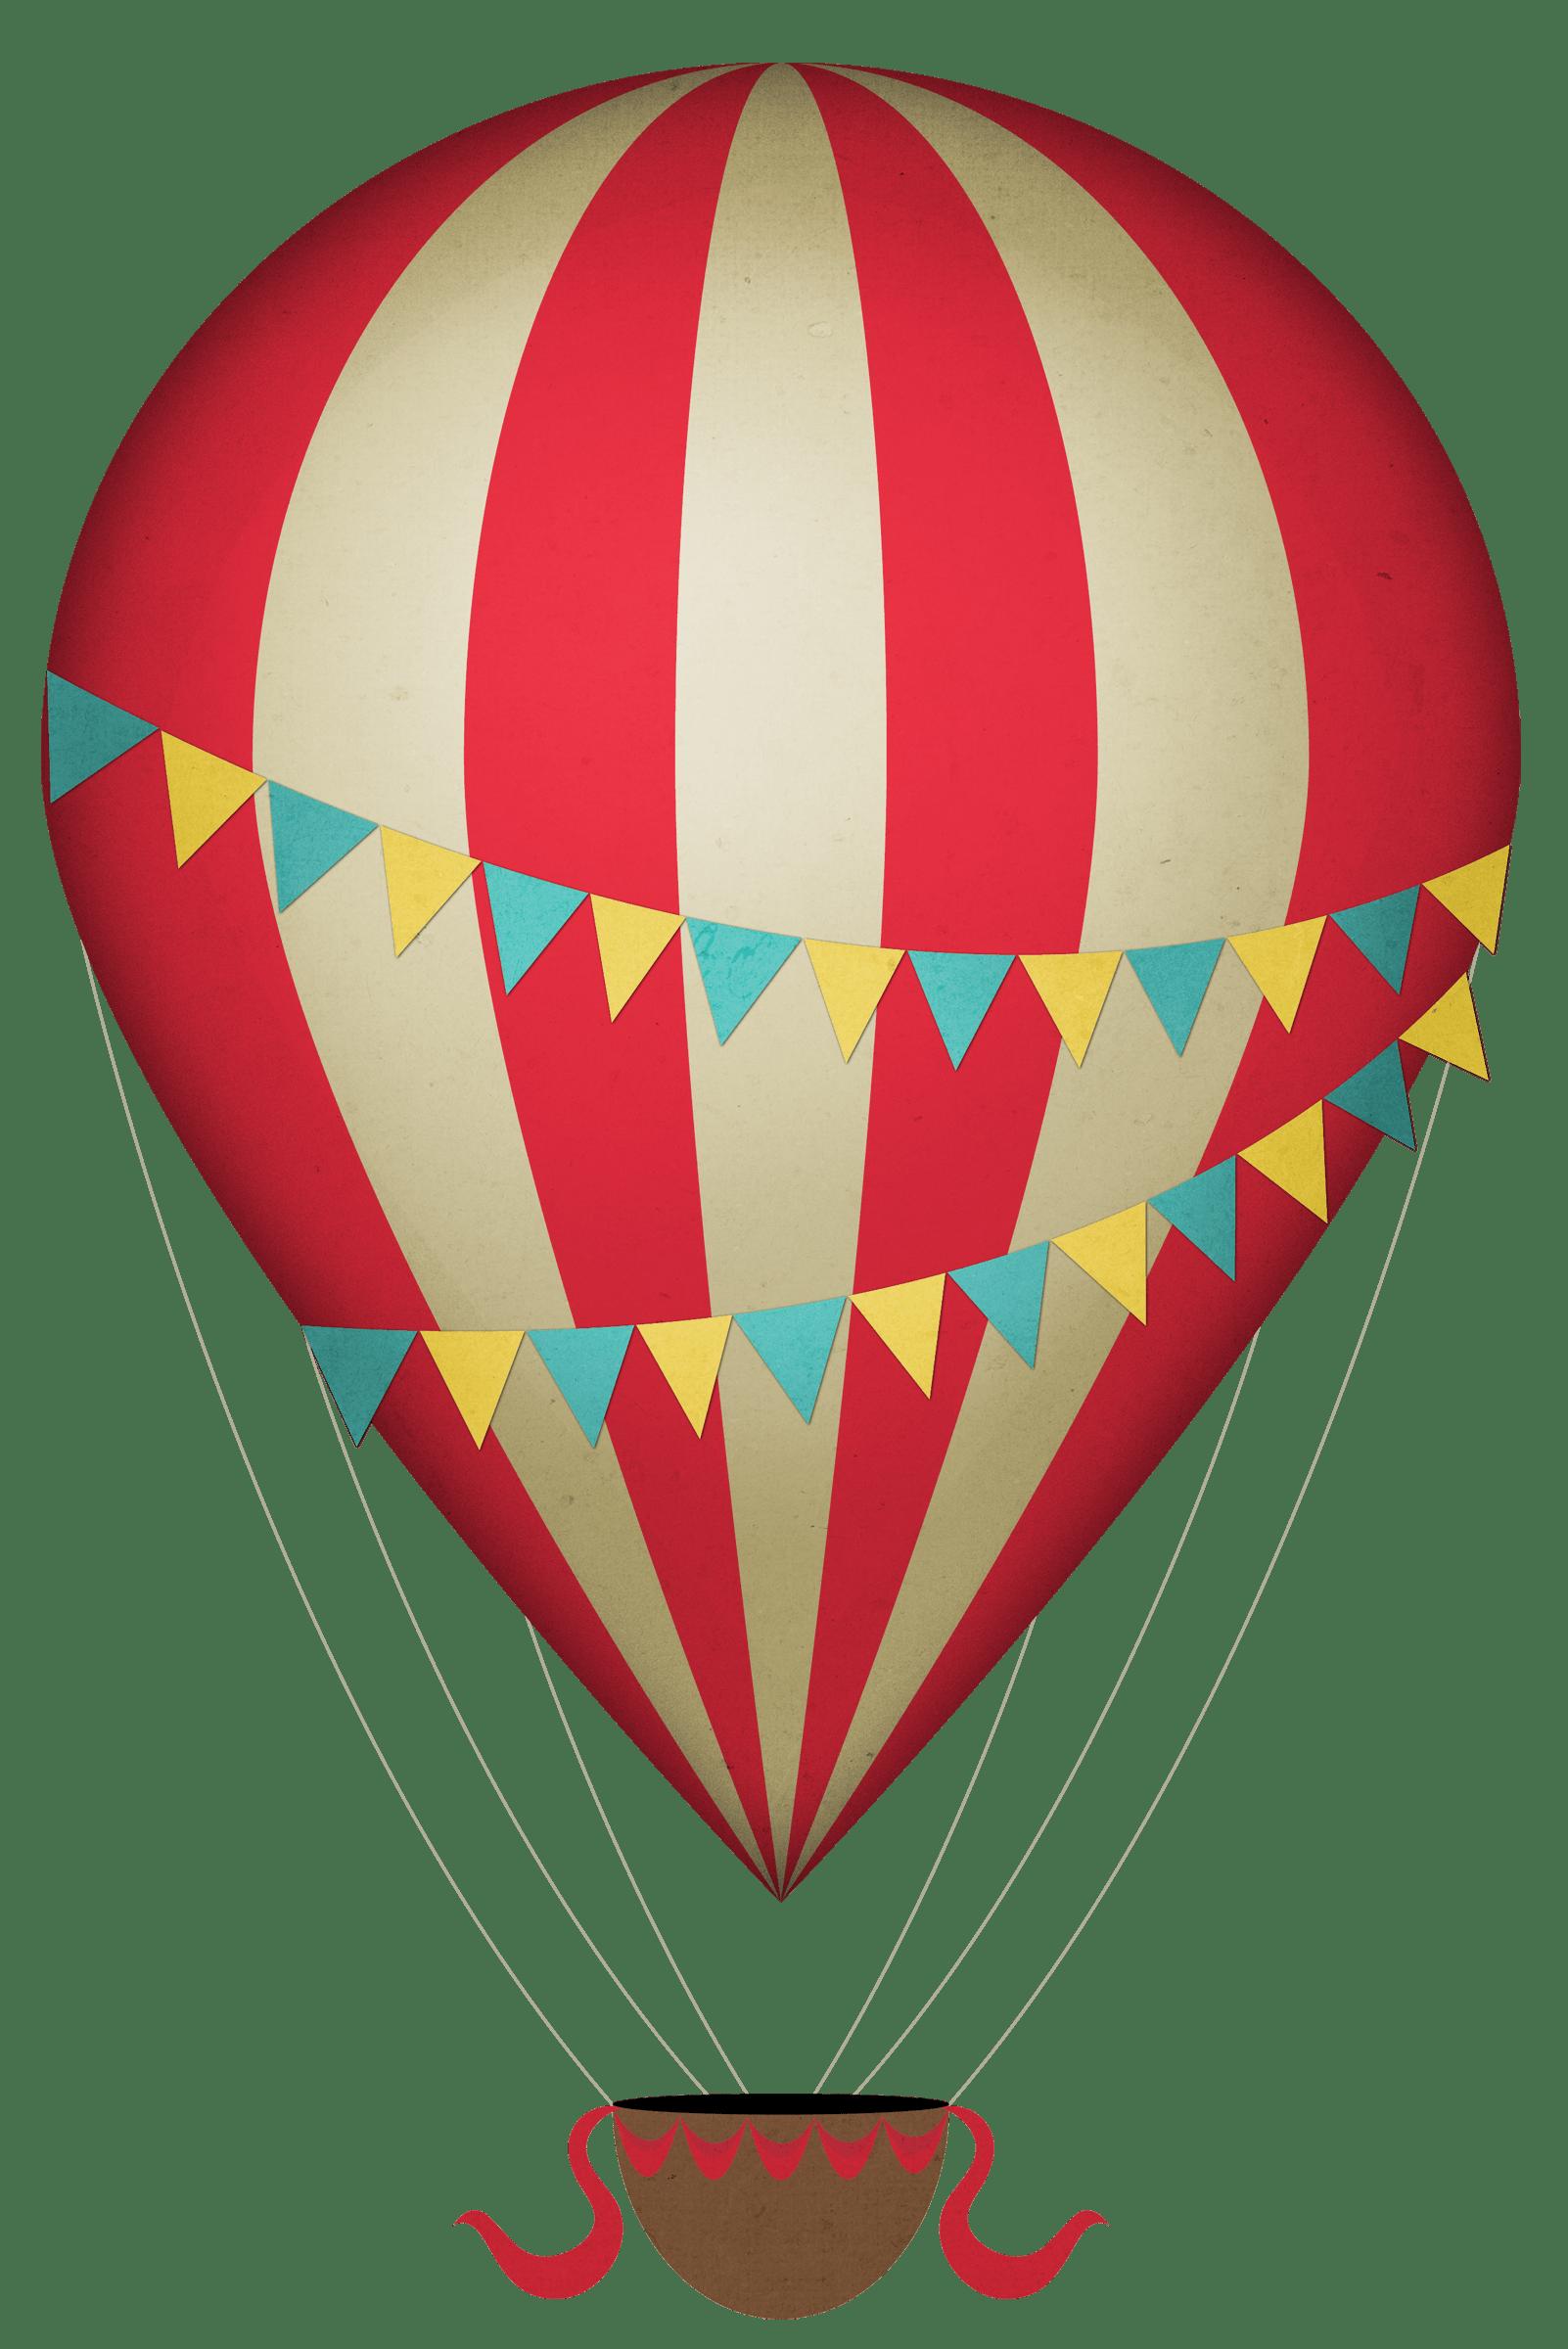 Fiesta clipart balloon. Vintage hot air pinterest